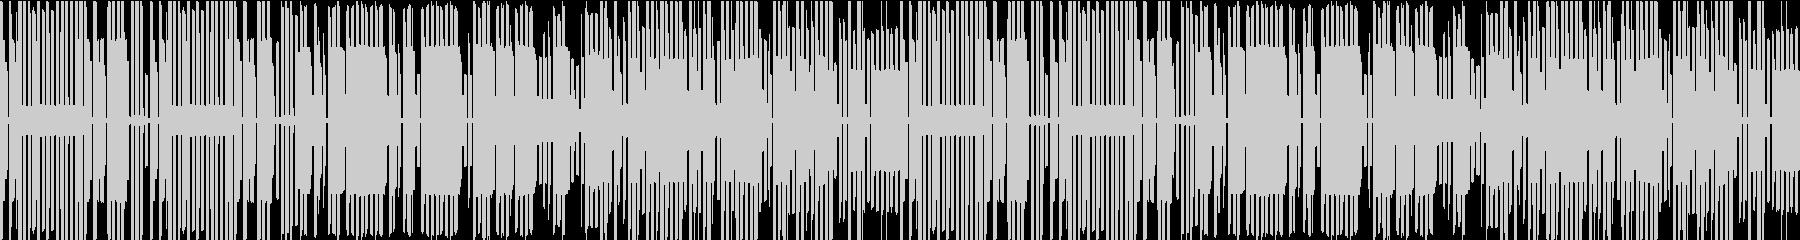 FC風ループ いいおみせの未再生の波形